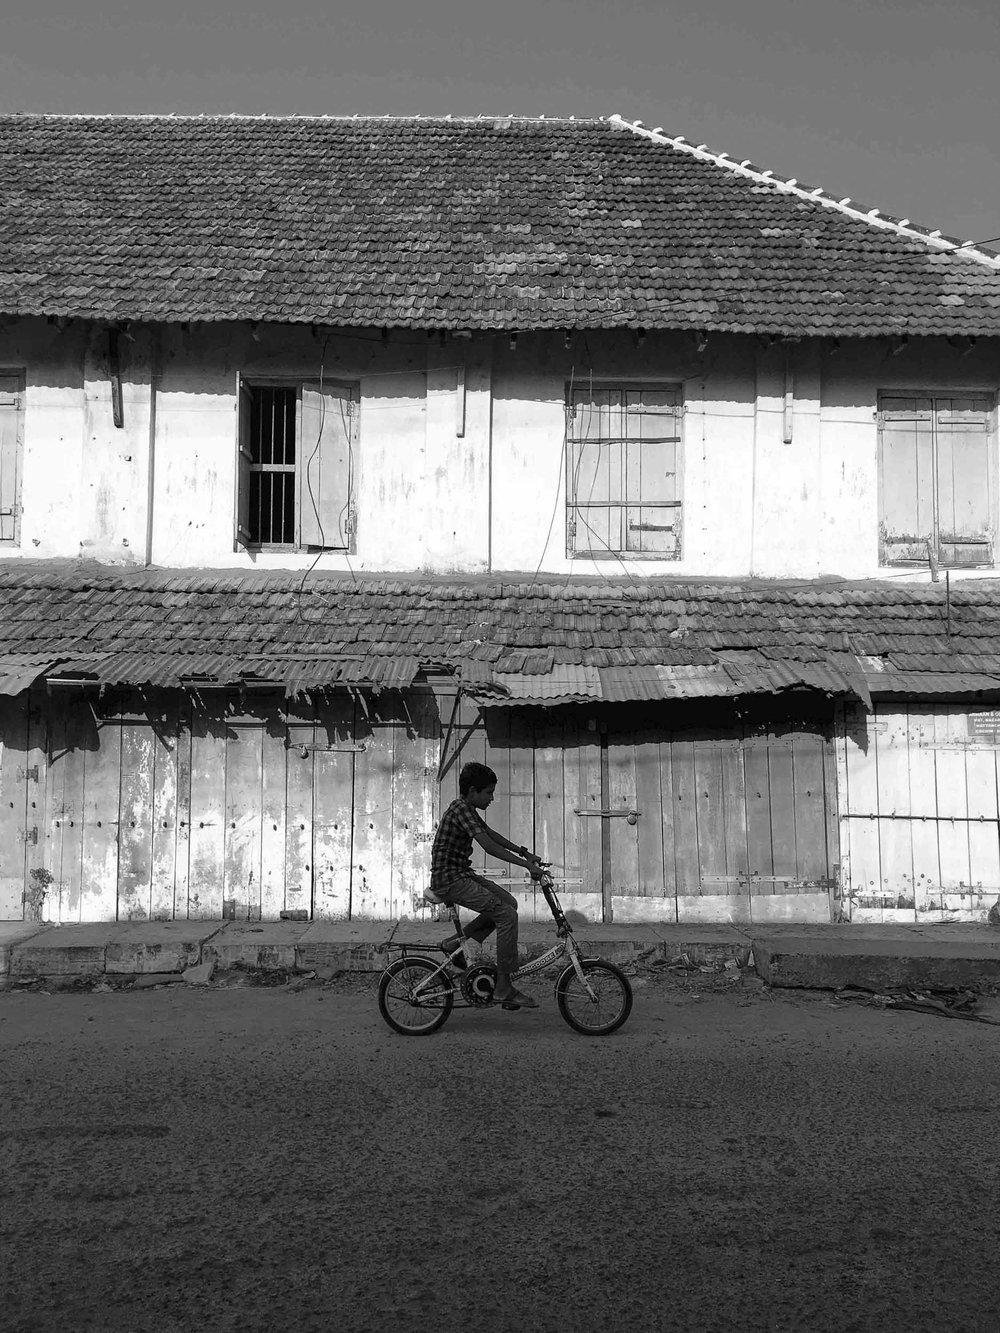 Sindhur_Photography_Kochi Muziris Biennale -2019-34.JPG